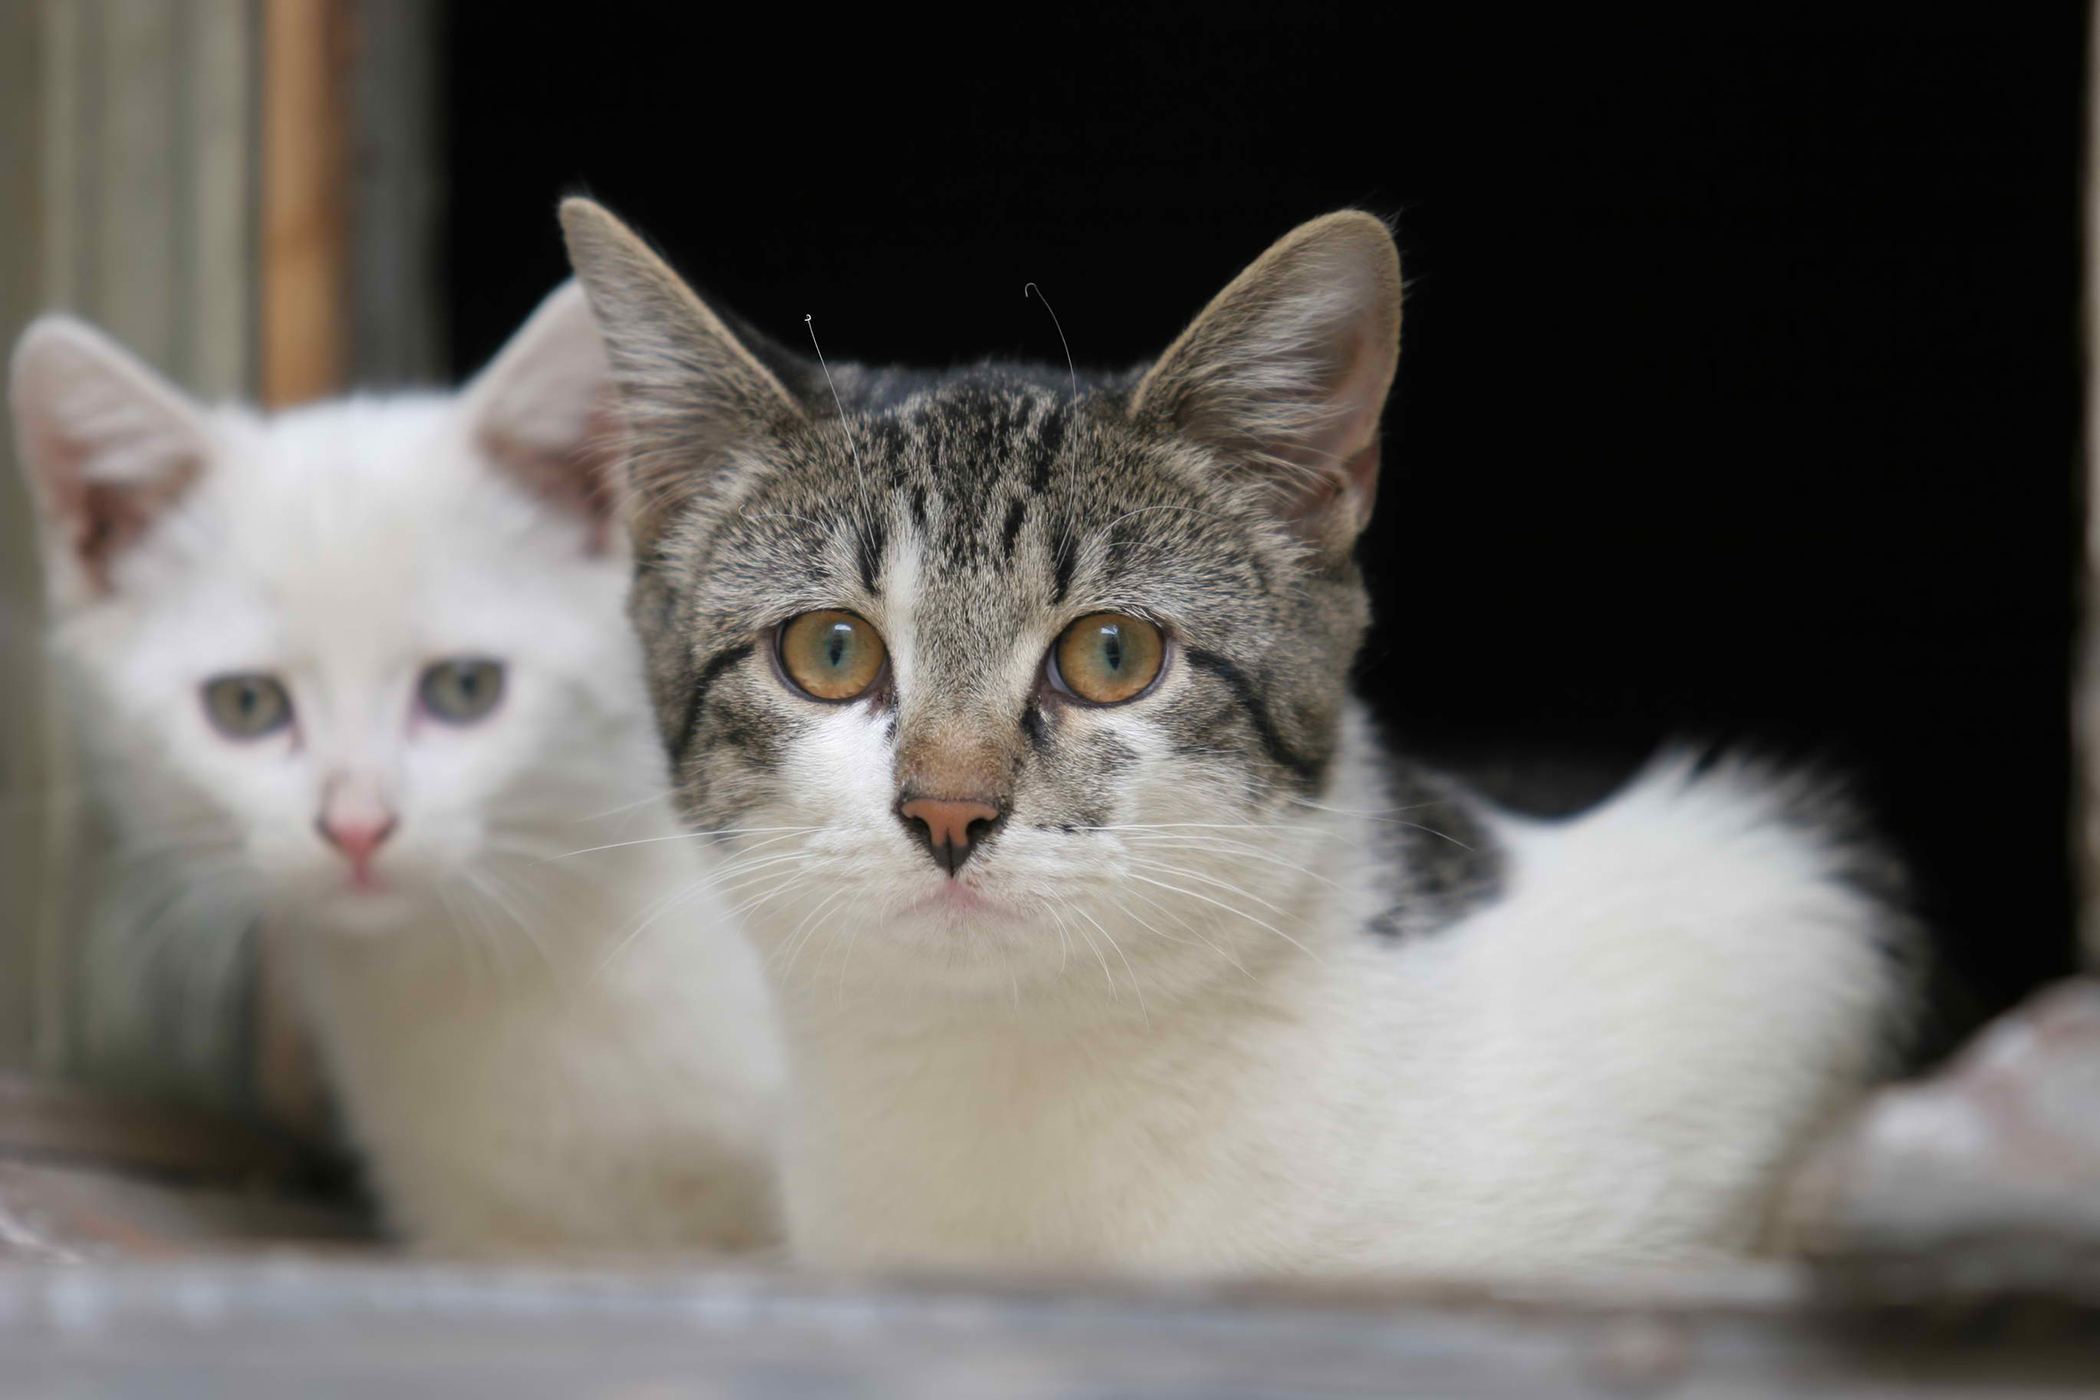 Meningomyelitis in Cats